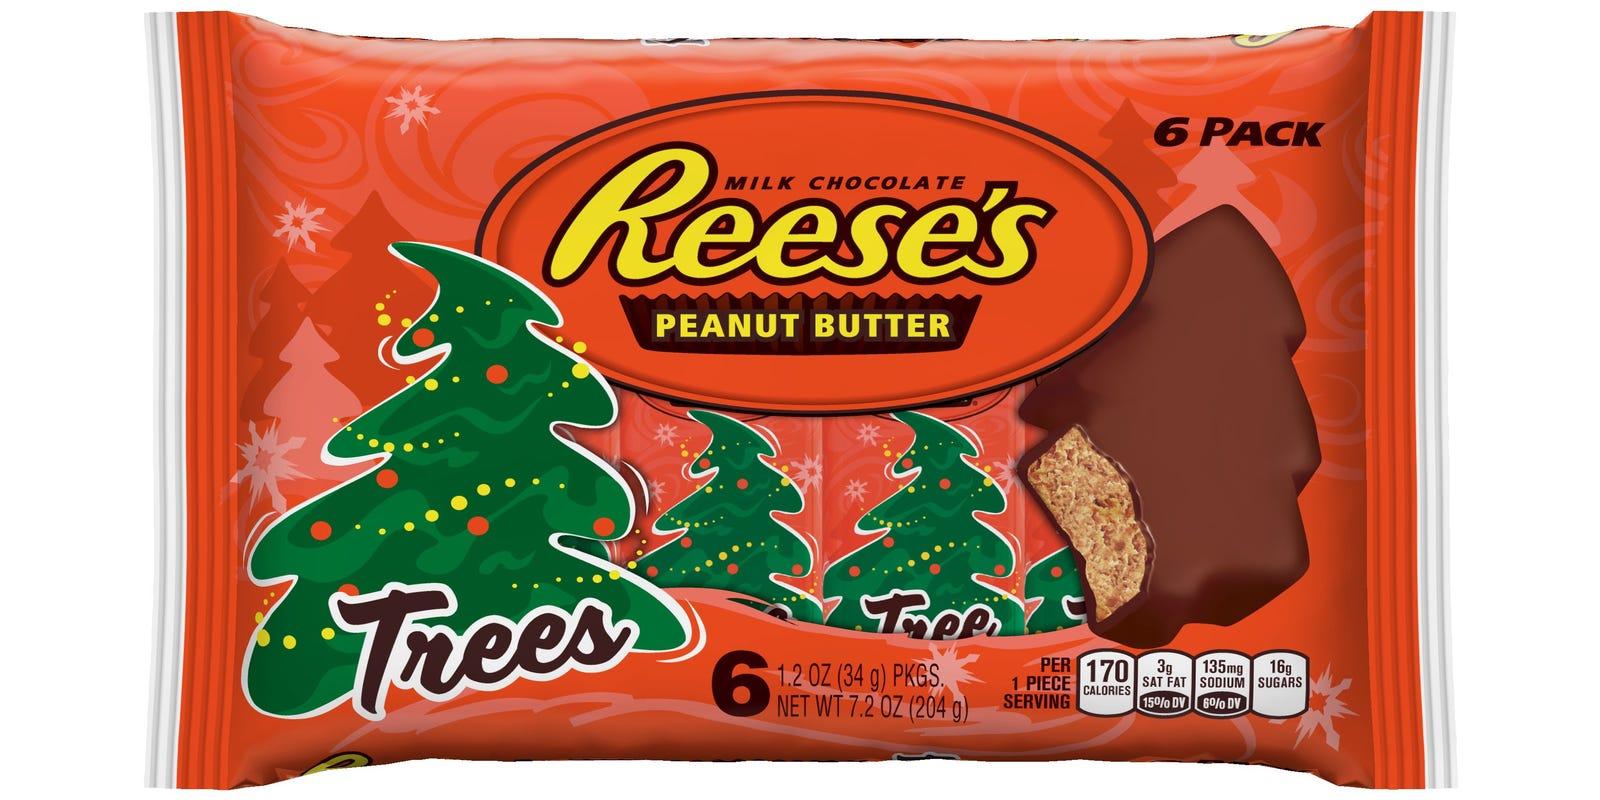 reeses christmas tree shapes causing stir